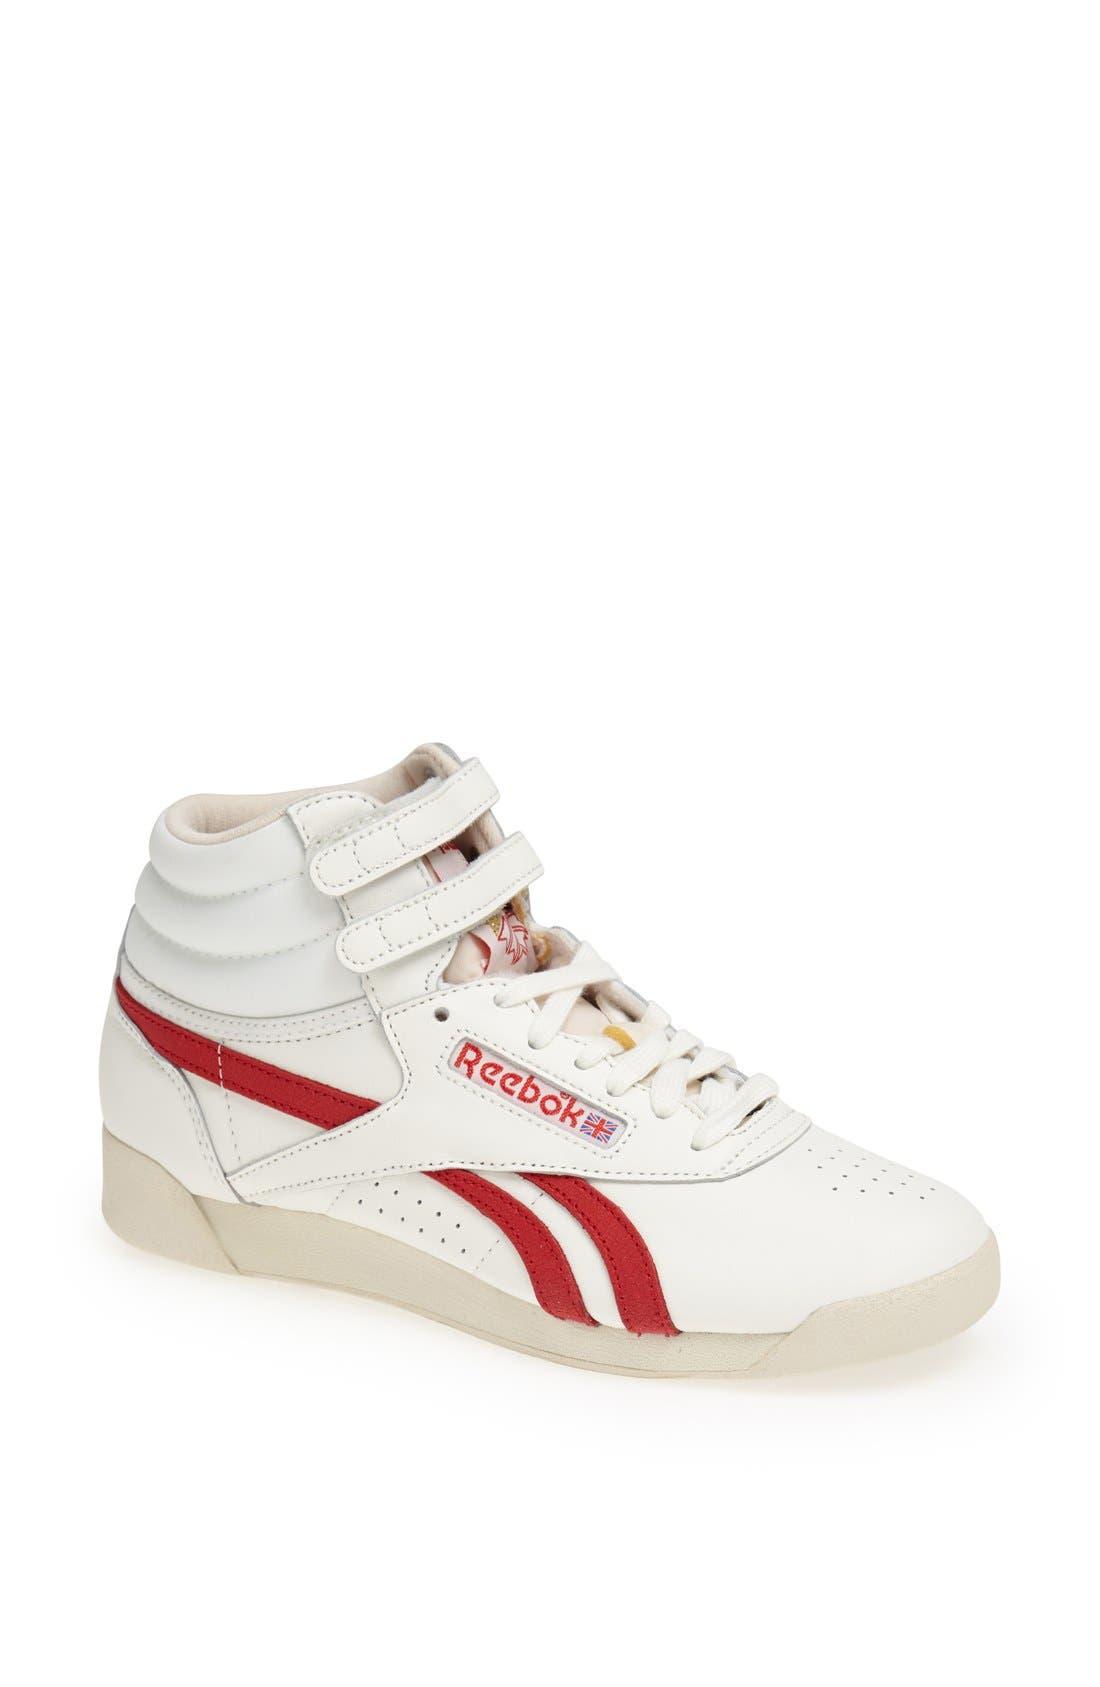 Main Image - Reebok 'Freestyle Hi - Vintage' Sneaker (Women)